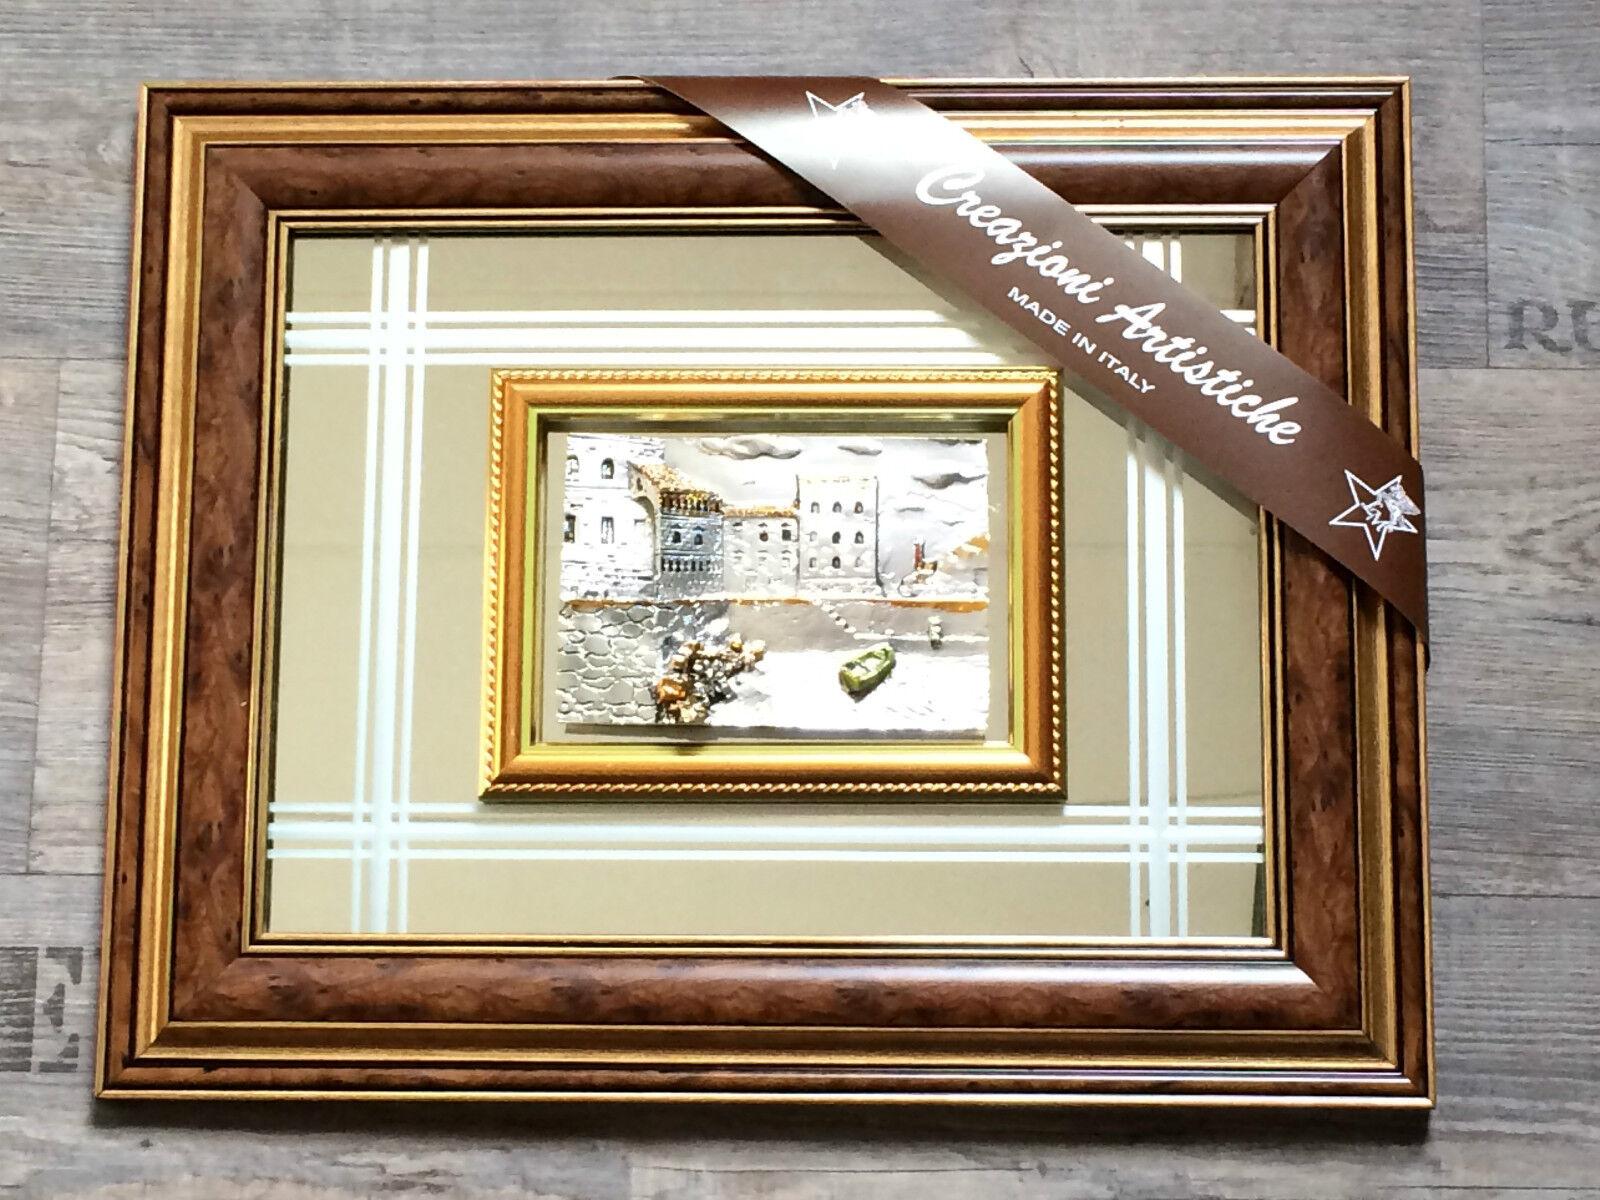 3 D Mahagoni Holz Spiegel Designer Bild Rahmen 50x40 cm Bilderrahmen ...